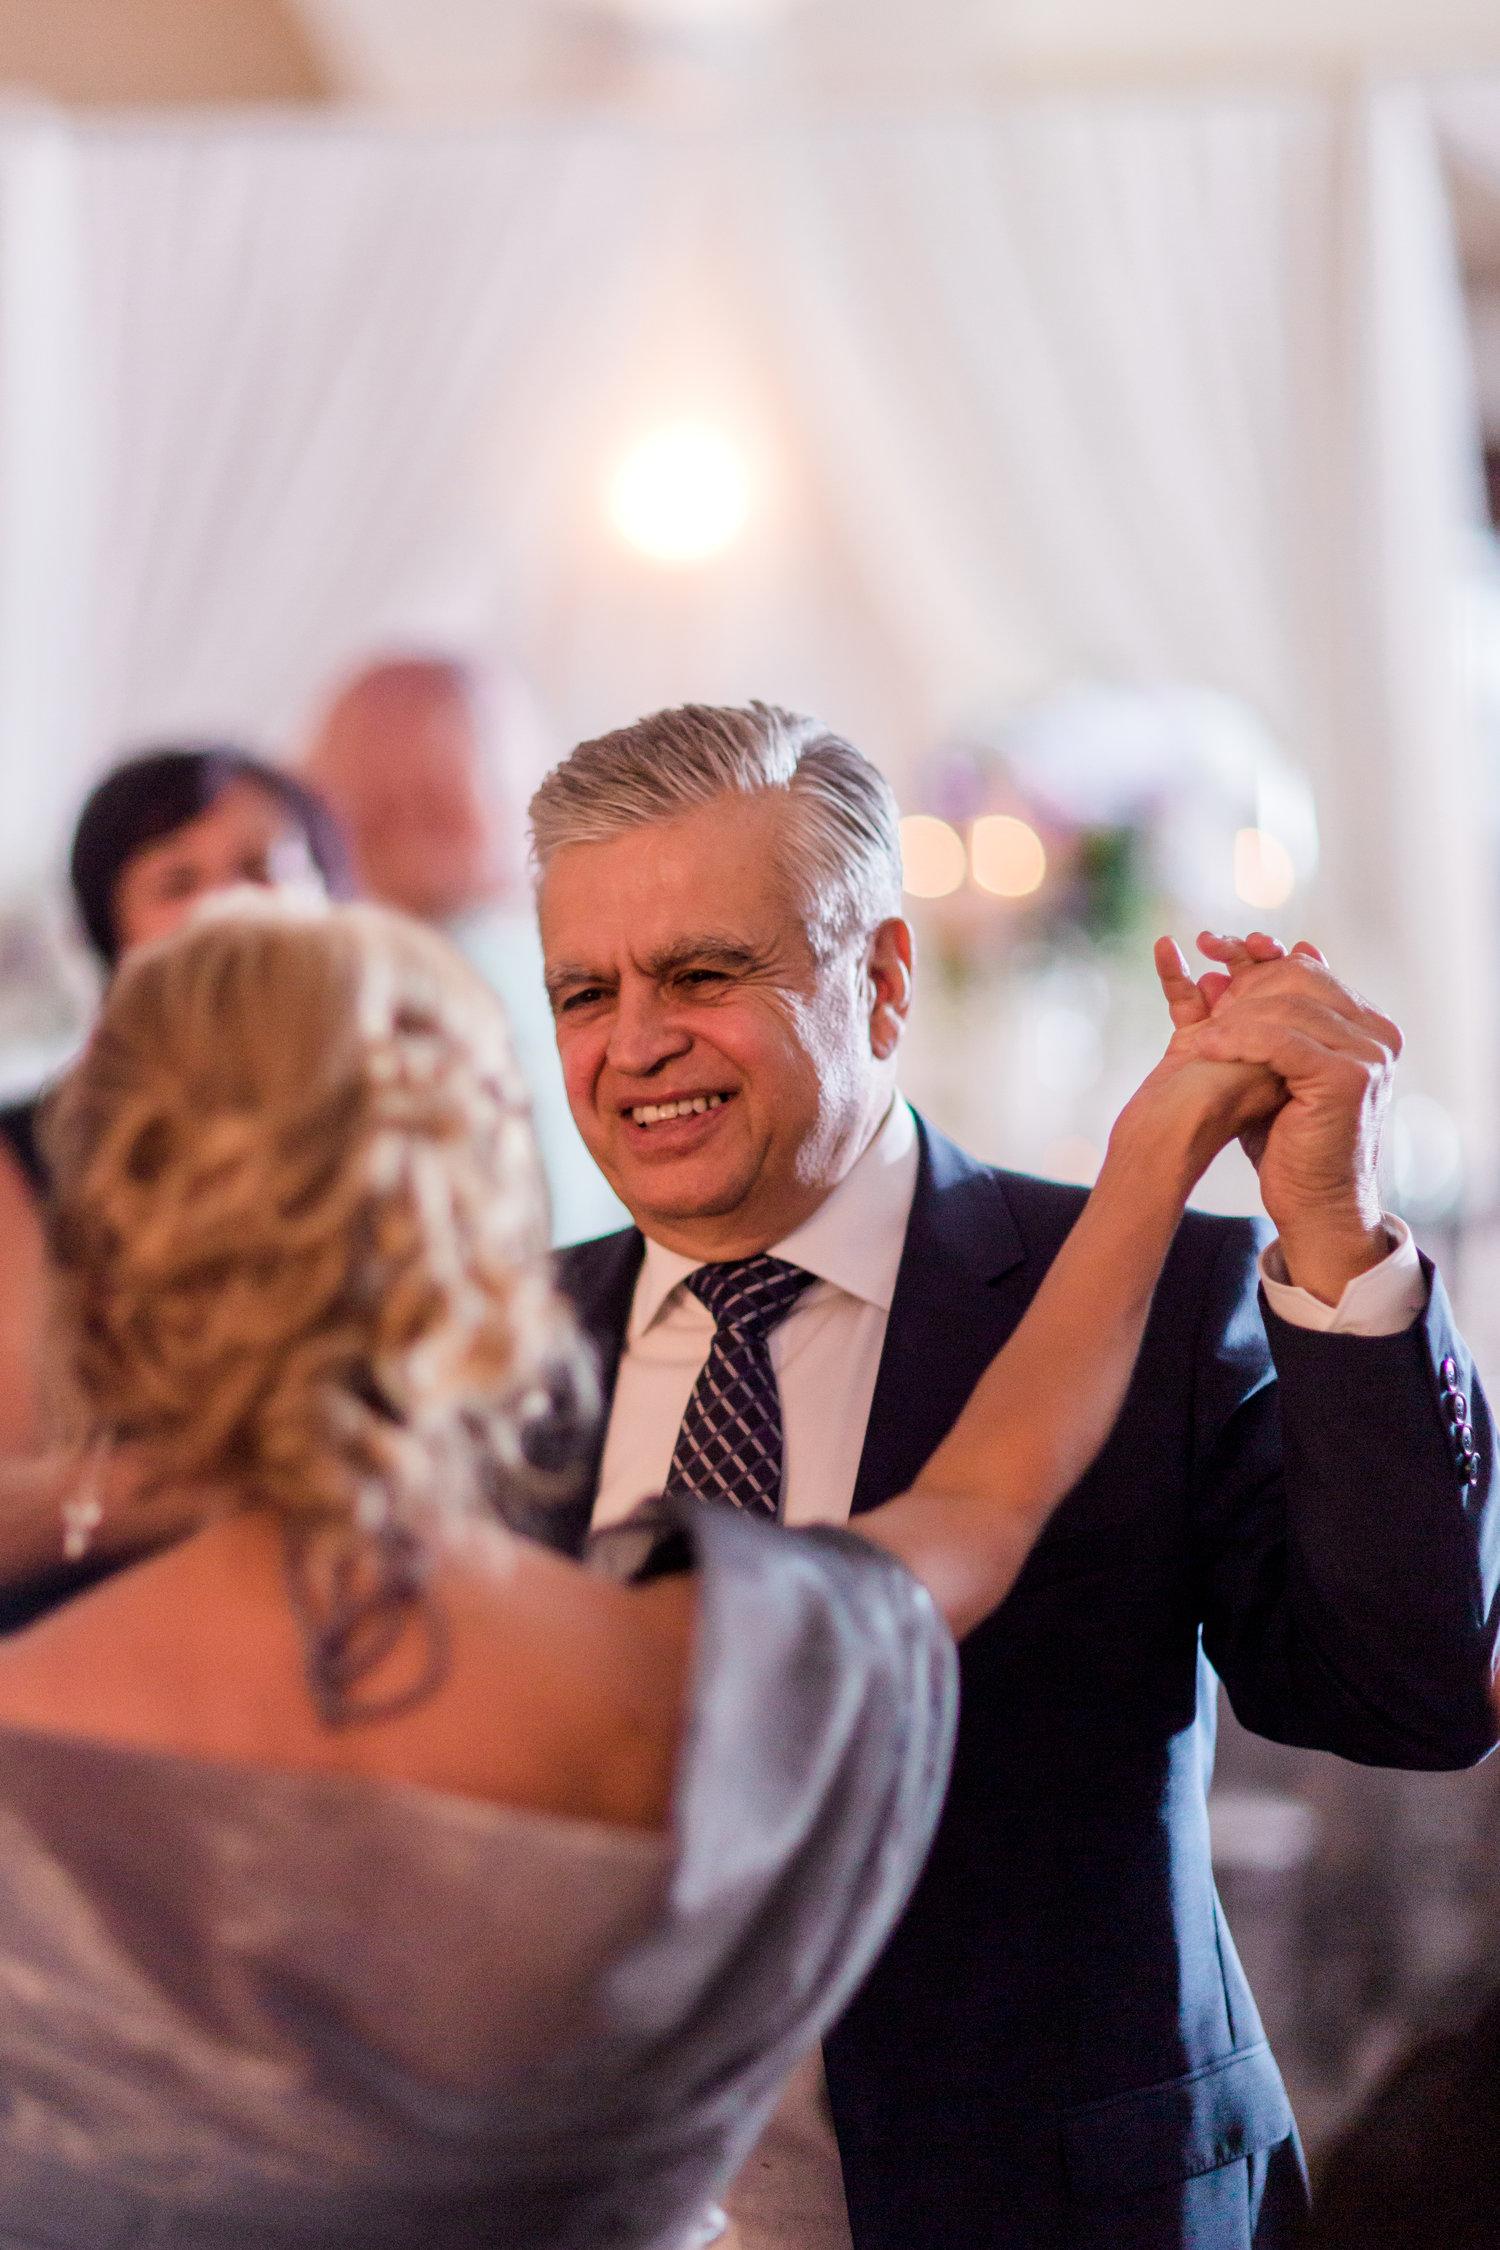 Danielle-Giroux-Amir-Golbazi-Toronto-Wedding-Photographer-Bellvue-Manor_DeLuca_2-775.jpg